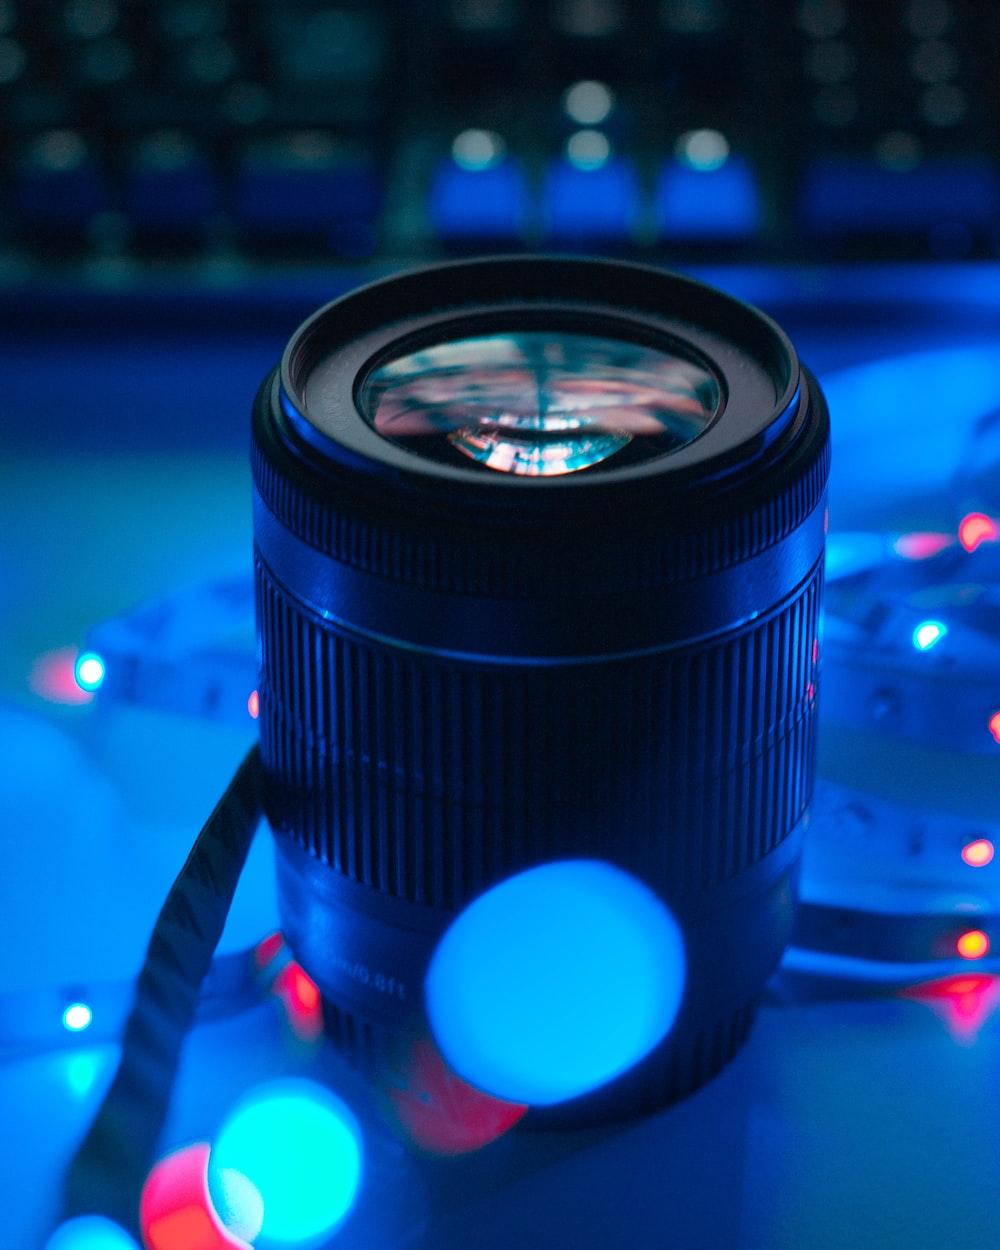 black camera lens with bokeh effect